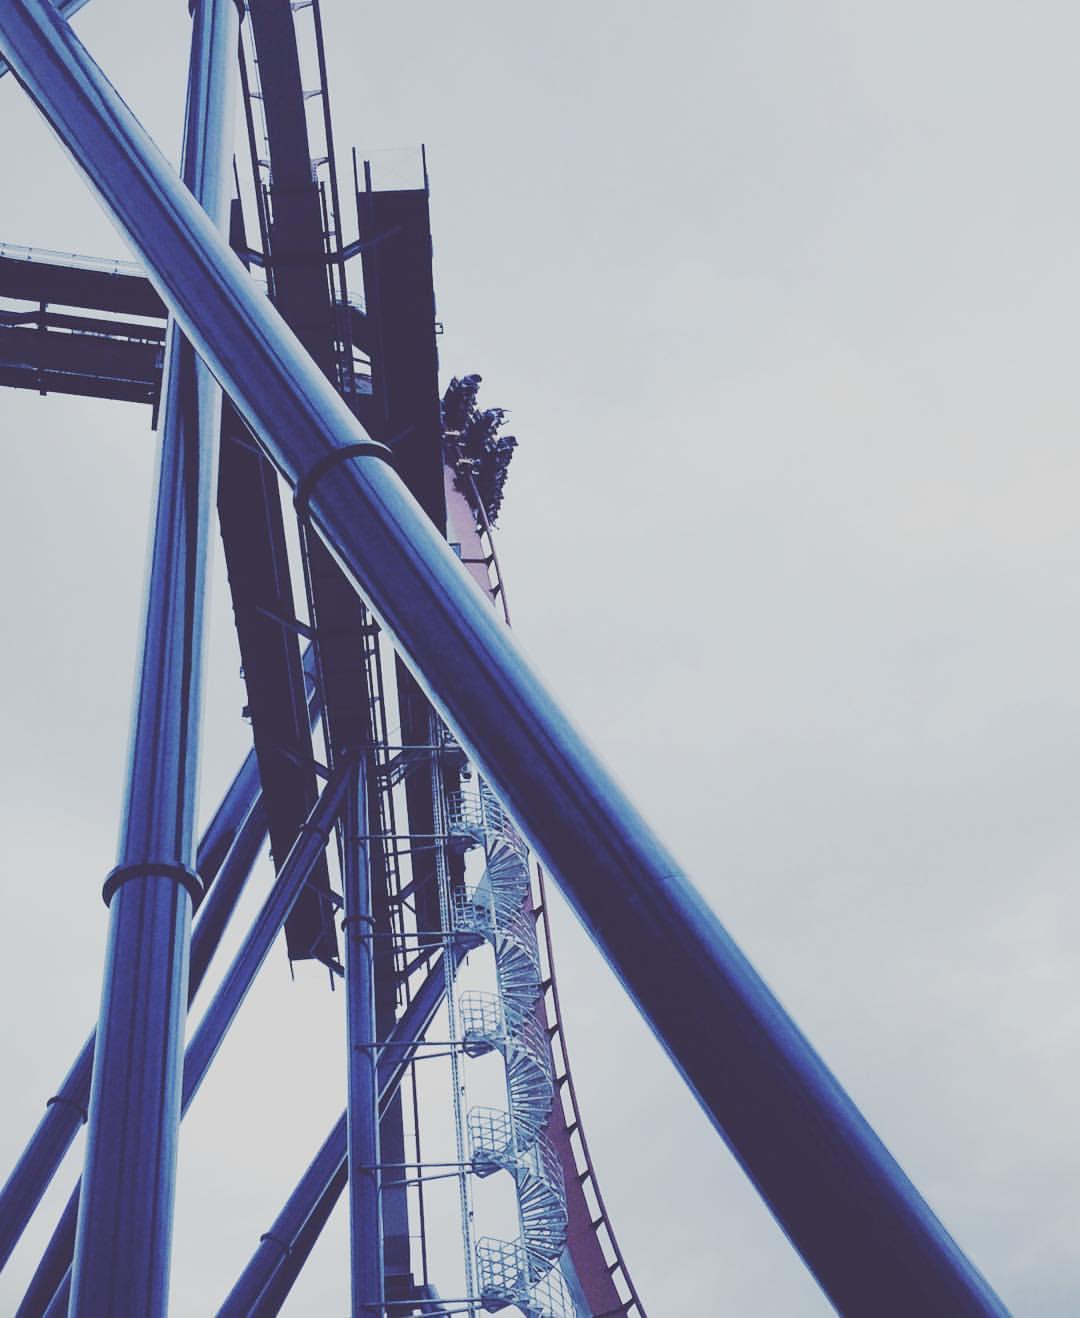 Valravn coaster. Iphone image.